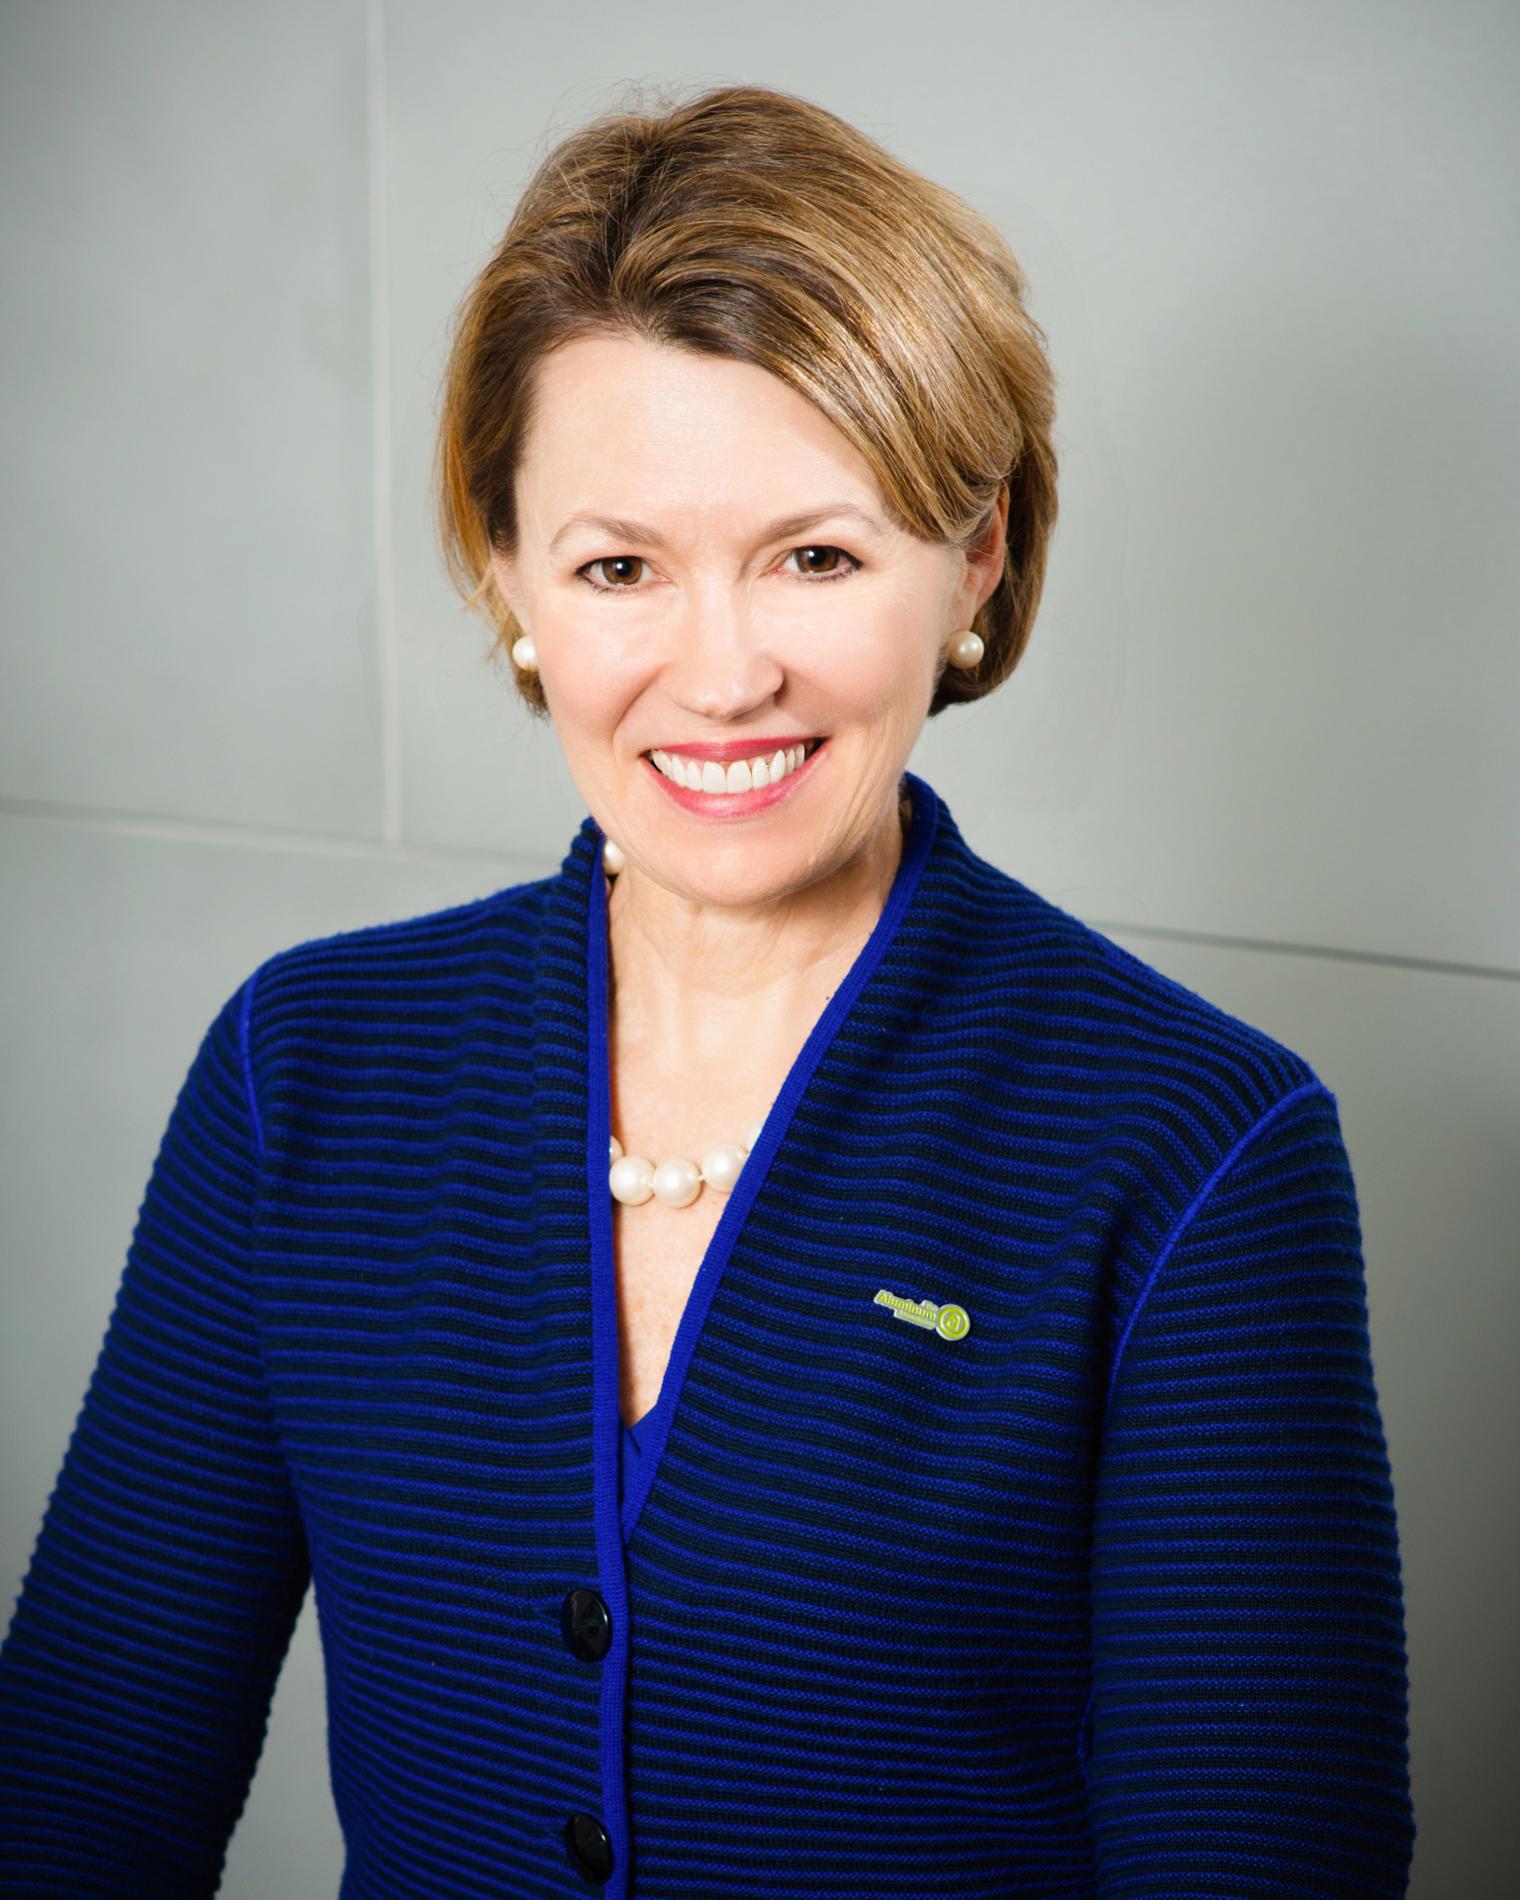 Heidi Brock. The Aluminum Association